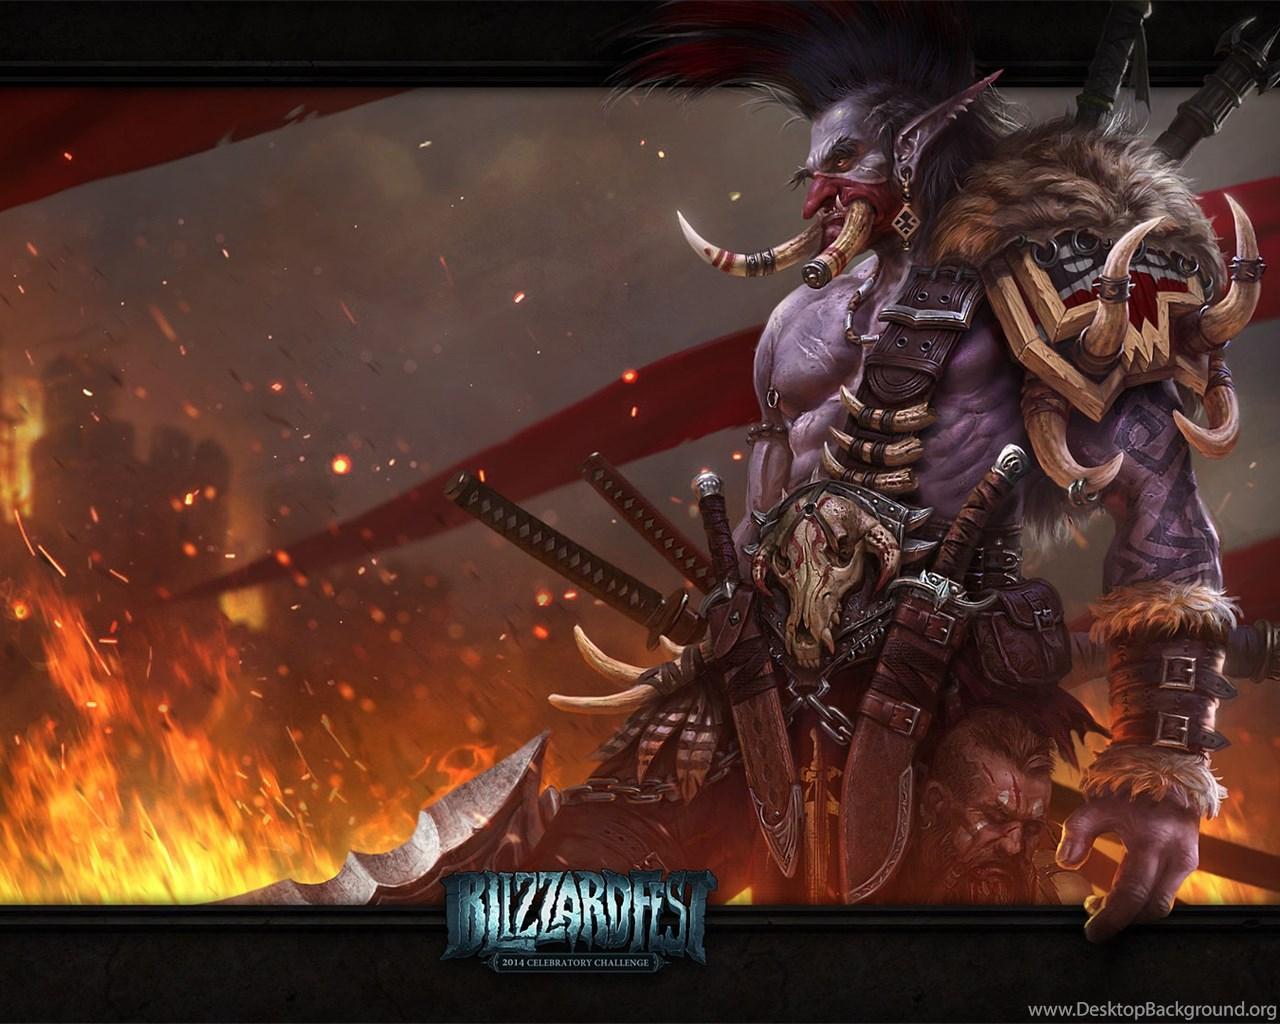 Ultra Hd 4k World Of Warcraft Wallpapers Hd Desktop Backgrounds